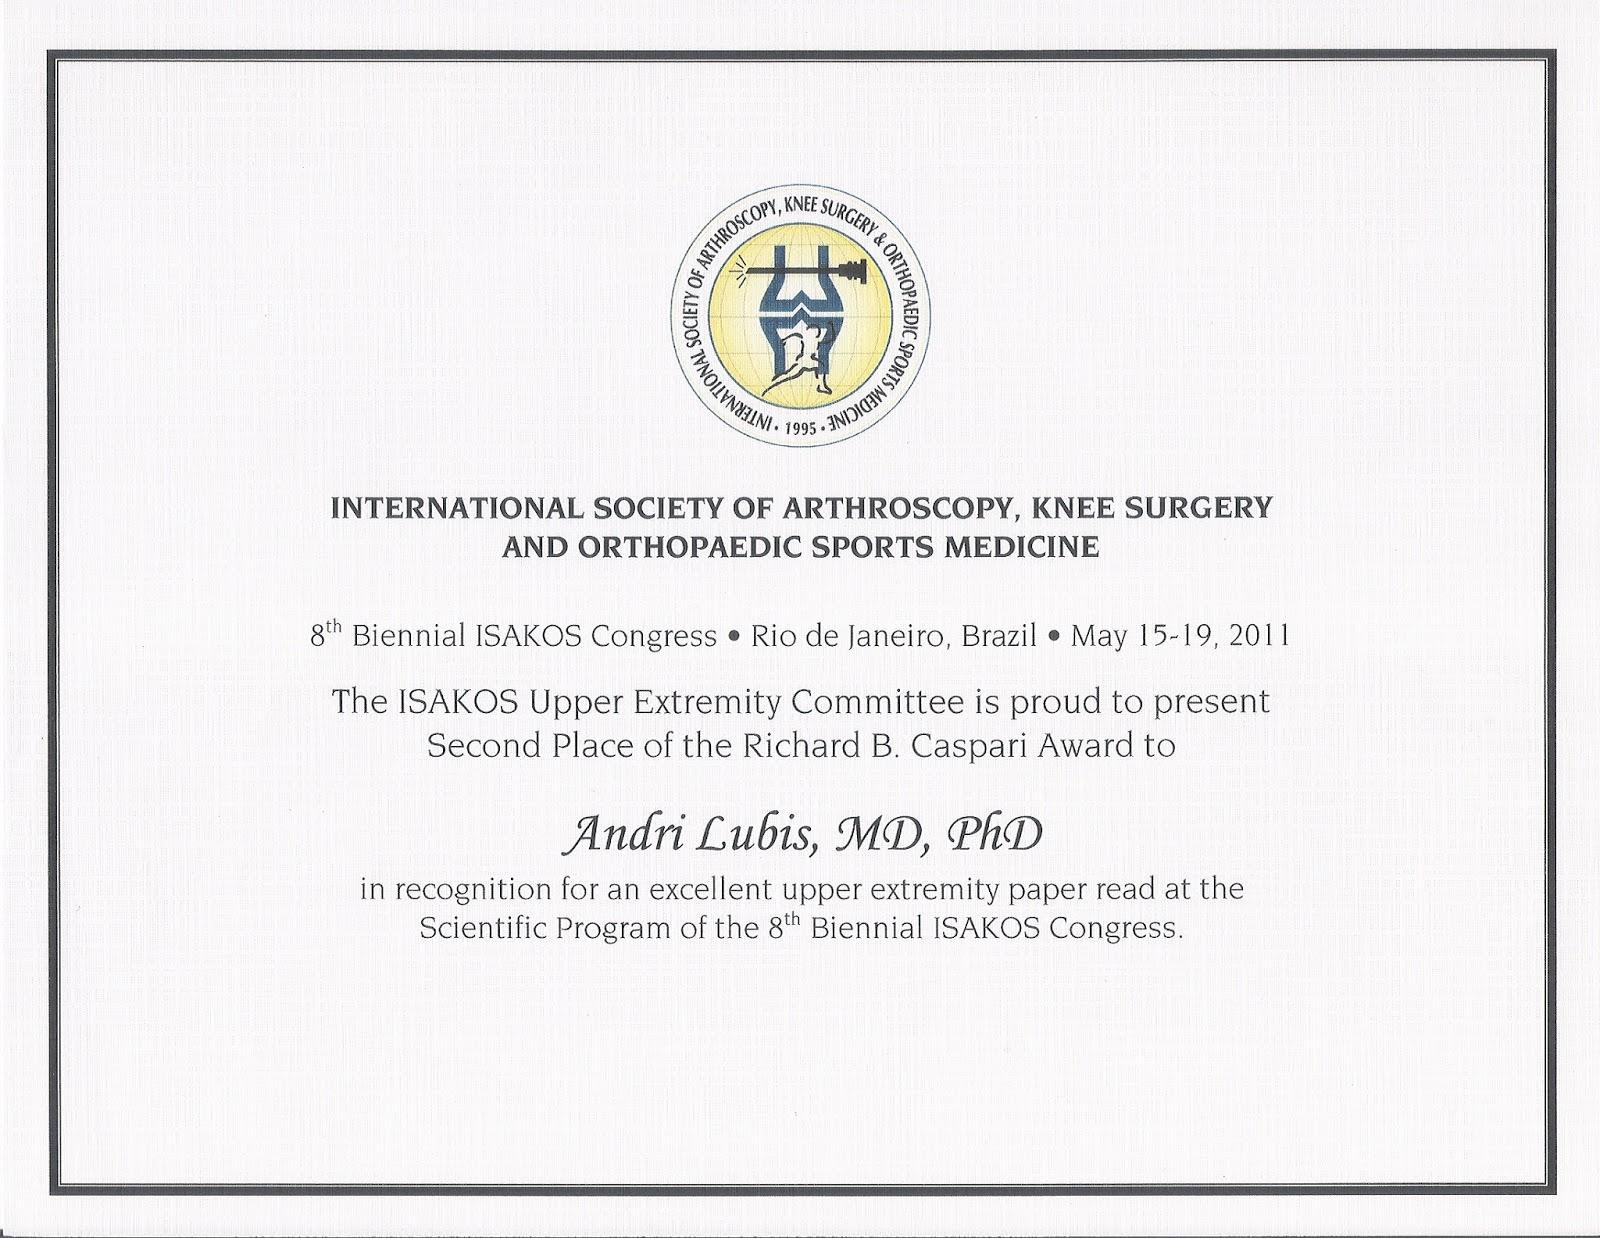 Penghargaan Richard Caspary Award - DR Andri Lubis